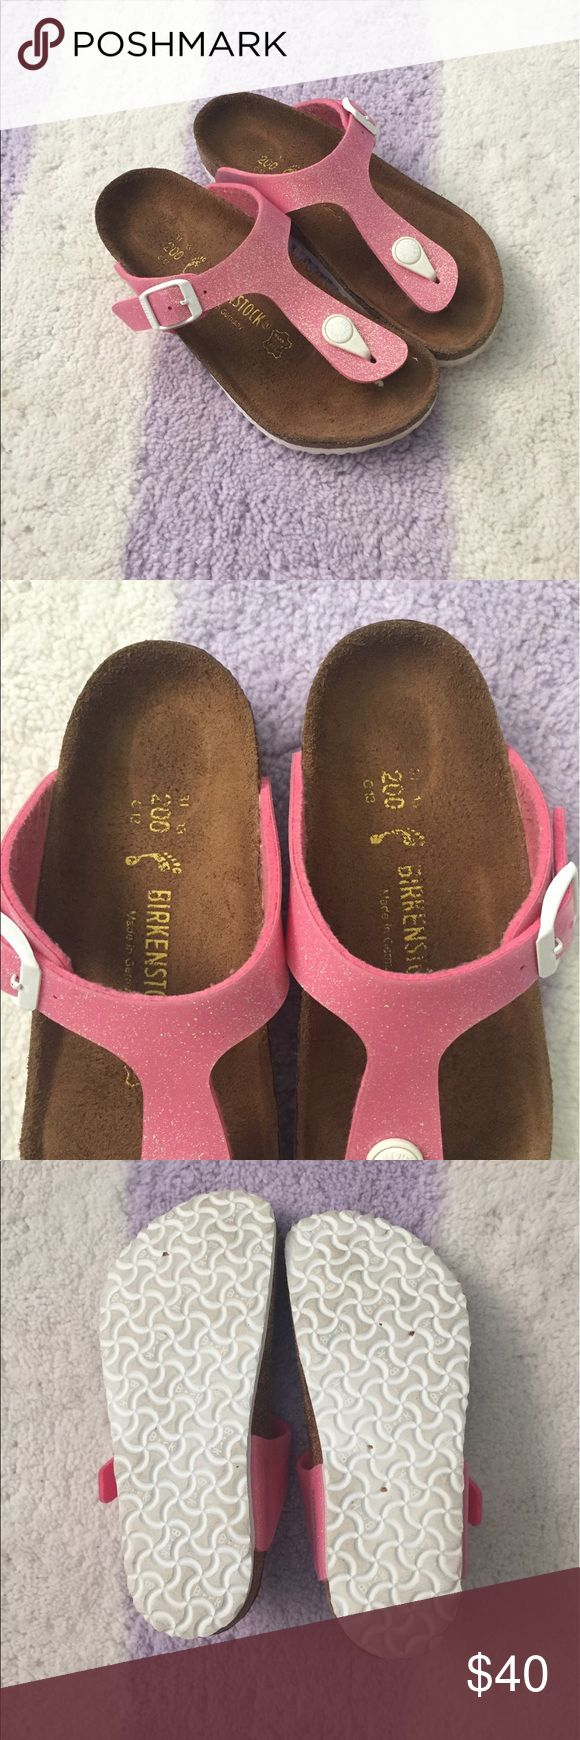 Girls Birkenstock sandals Excellent condition! Worn 1x. Pink sparkle. Size 13 Birkenstock Shoes Sandals & Flip Flops